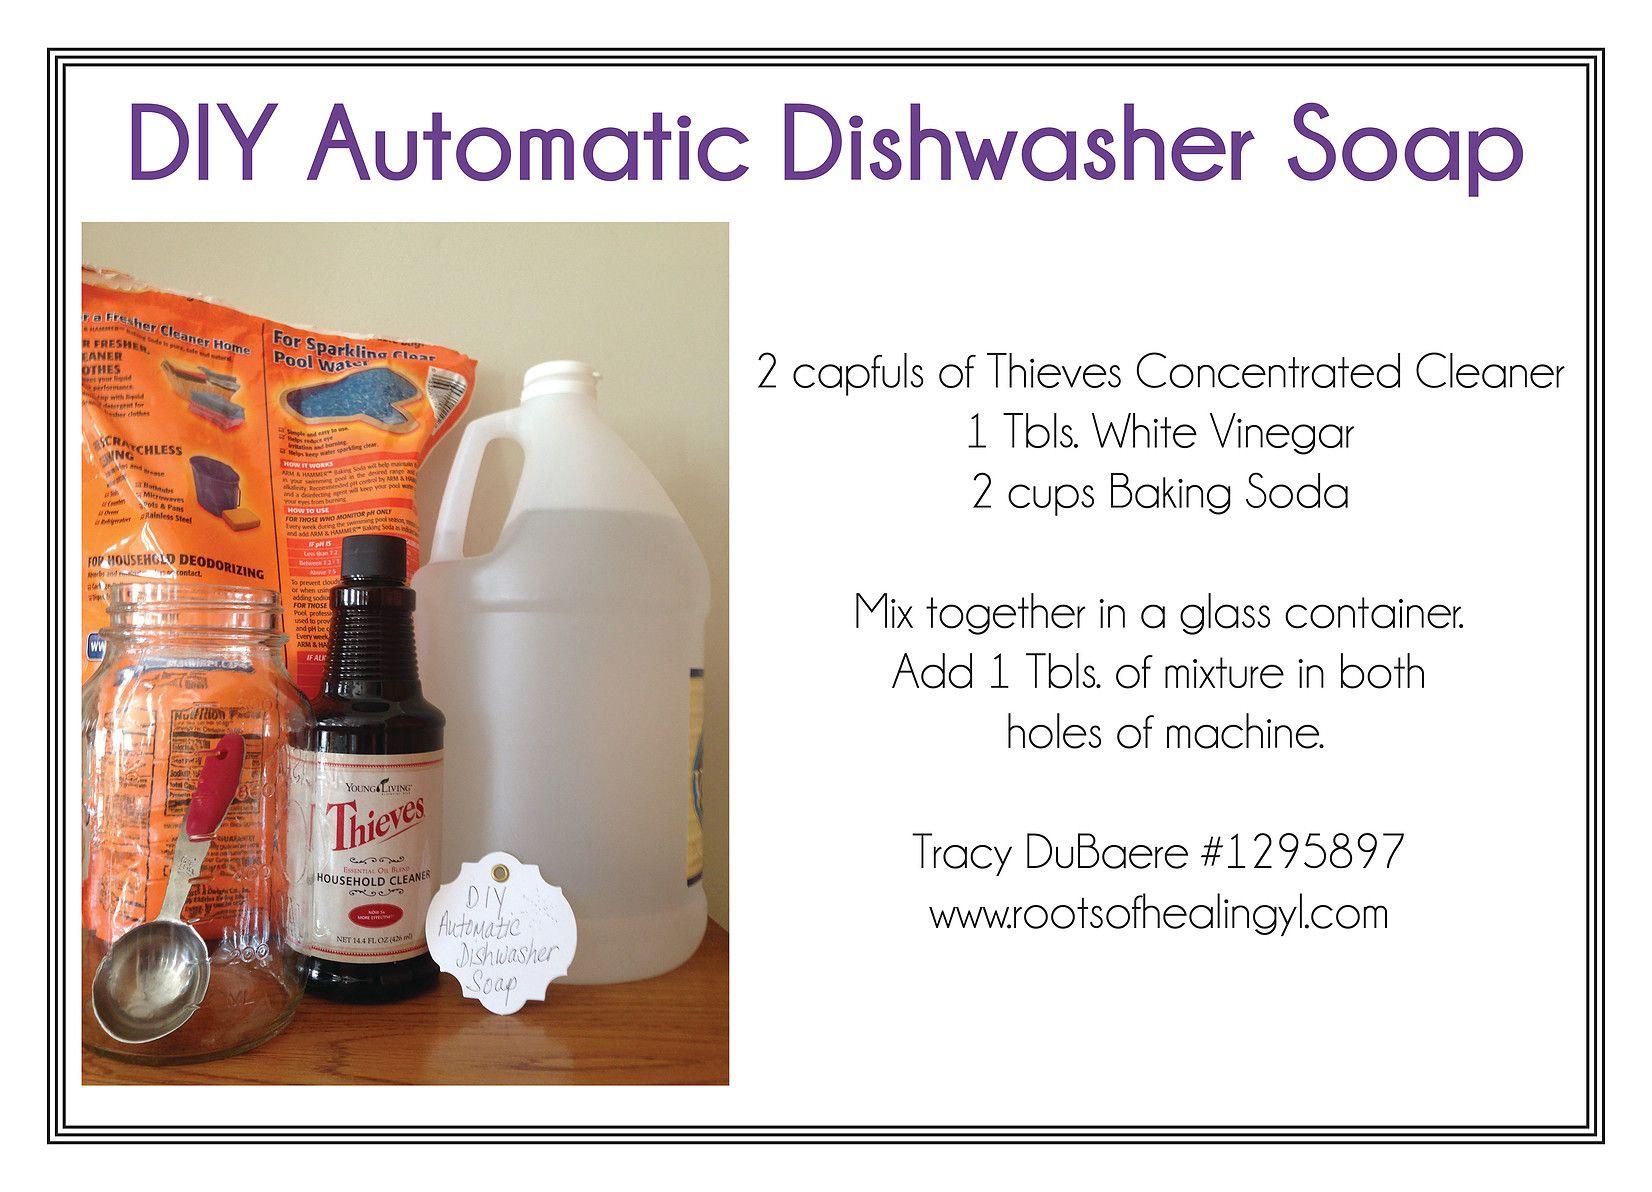 DIY Automatic Dishwasher Soap with Essential Oils Diy